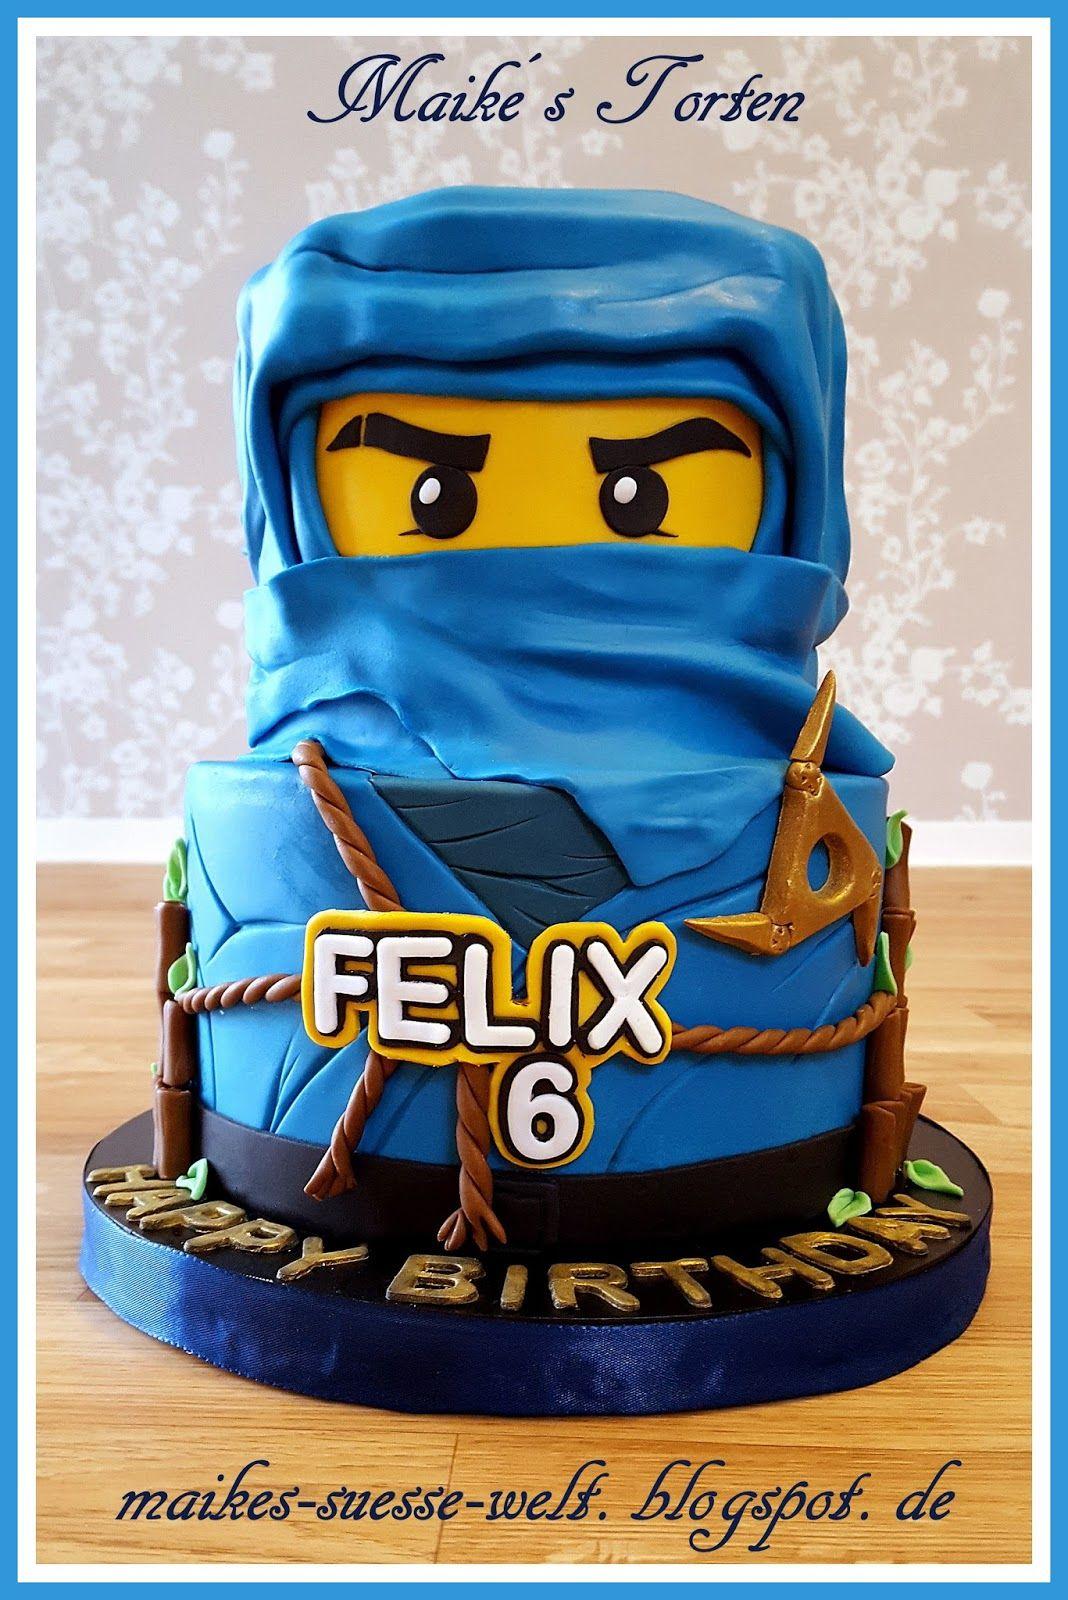 Lego Ninjago In 2020 | Kinder Geburtstag Torte bei Geburtstagstorte Für Jungs